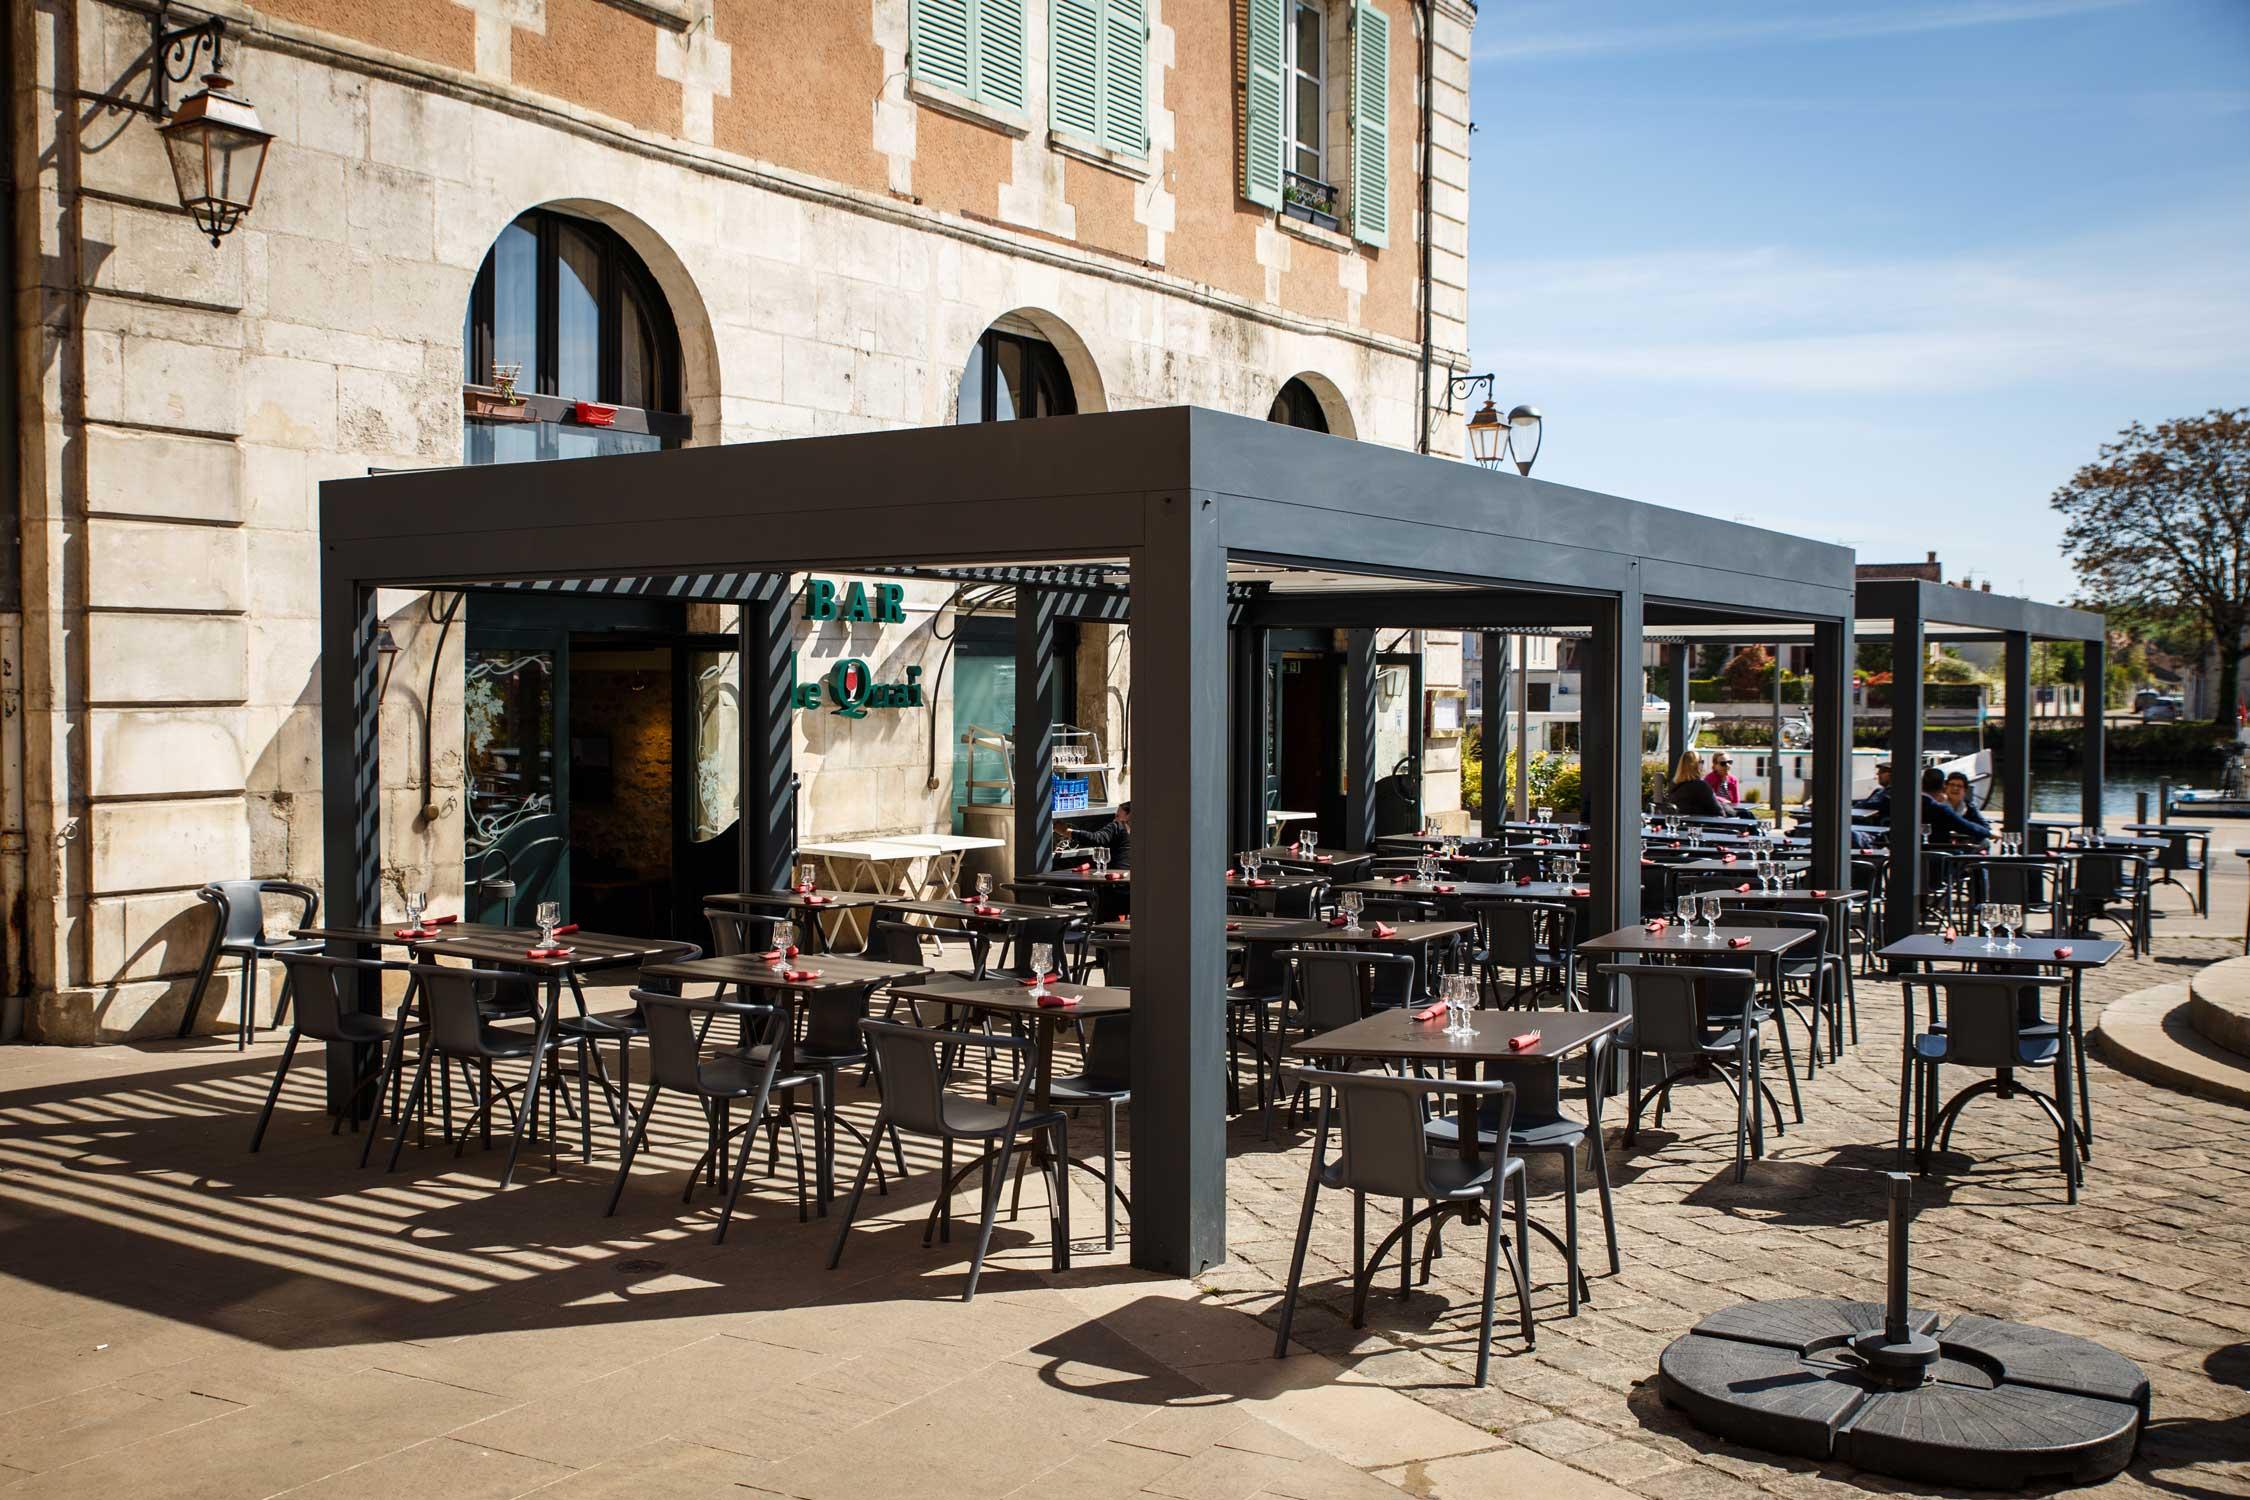 Terrasse du Quai - Place Saint-Nicolas Auxerre